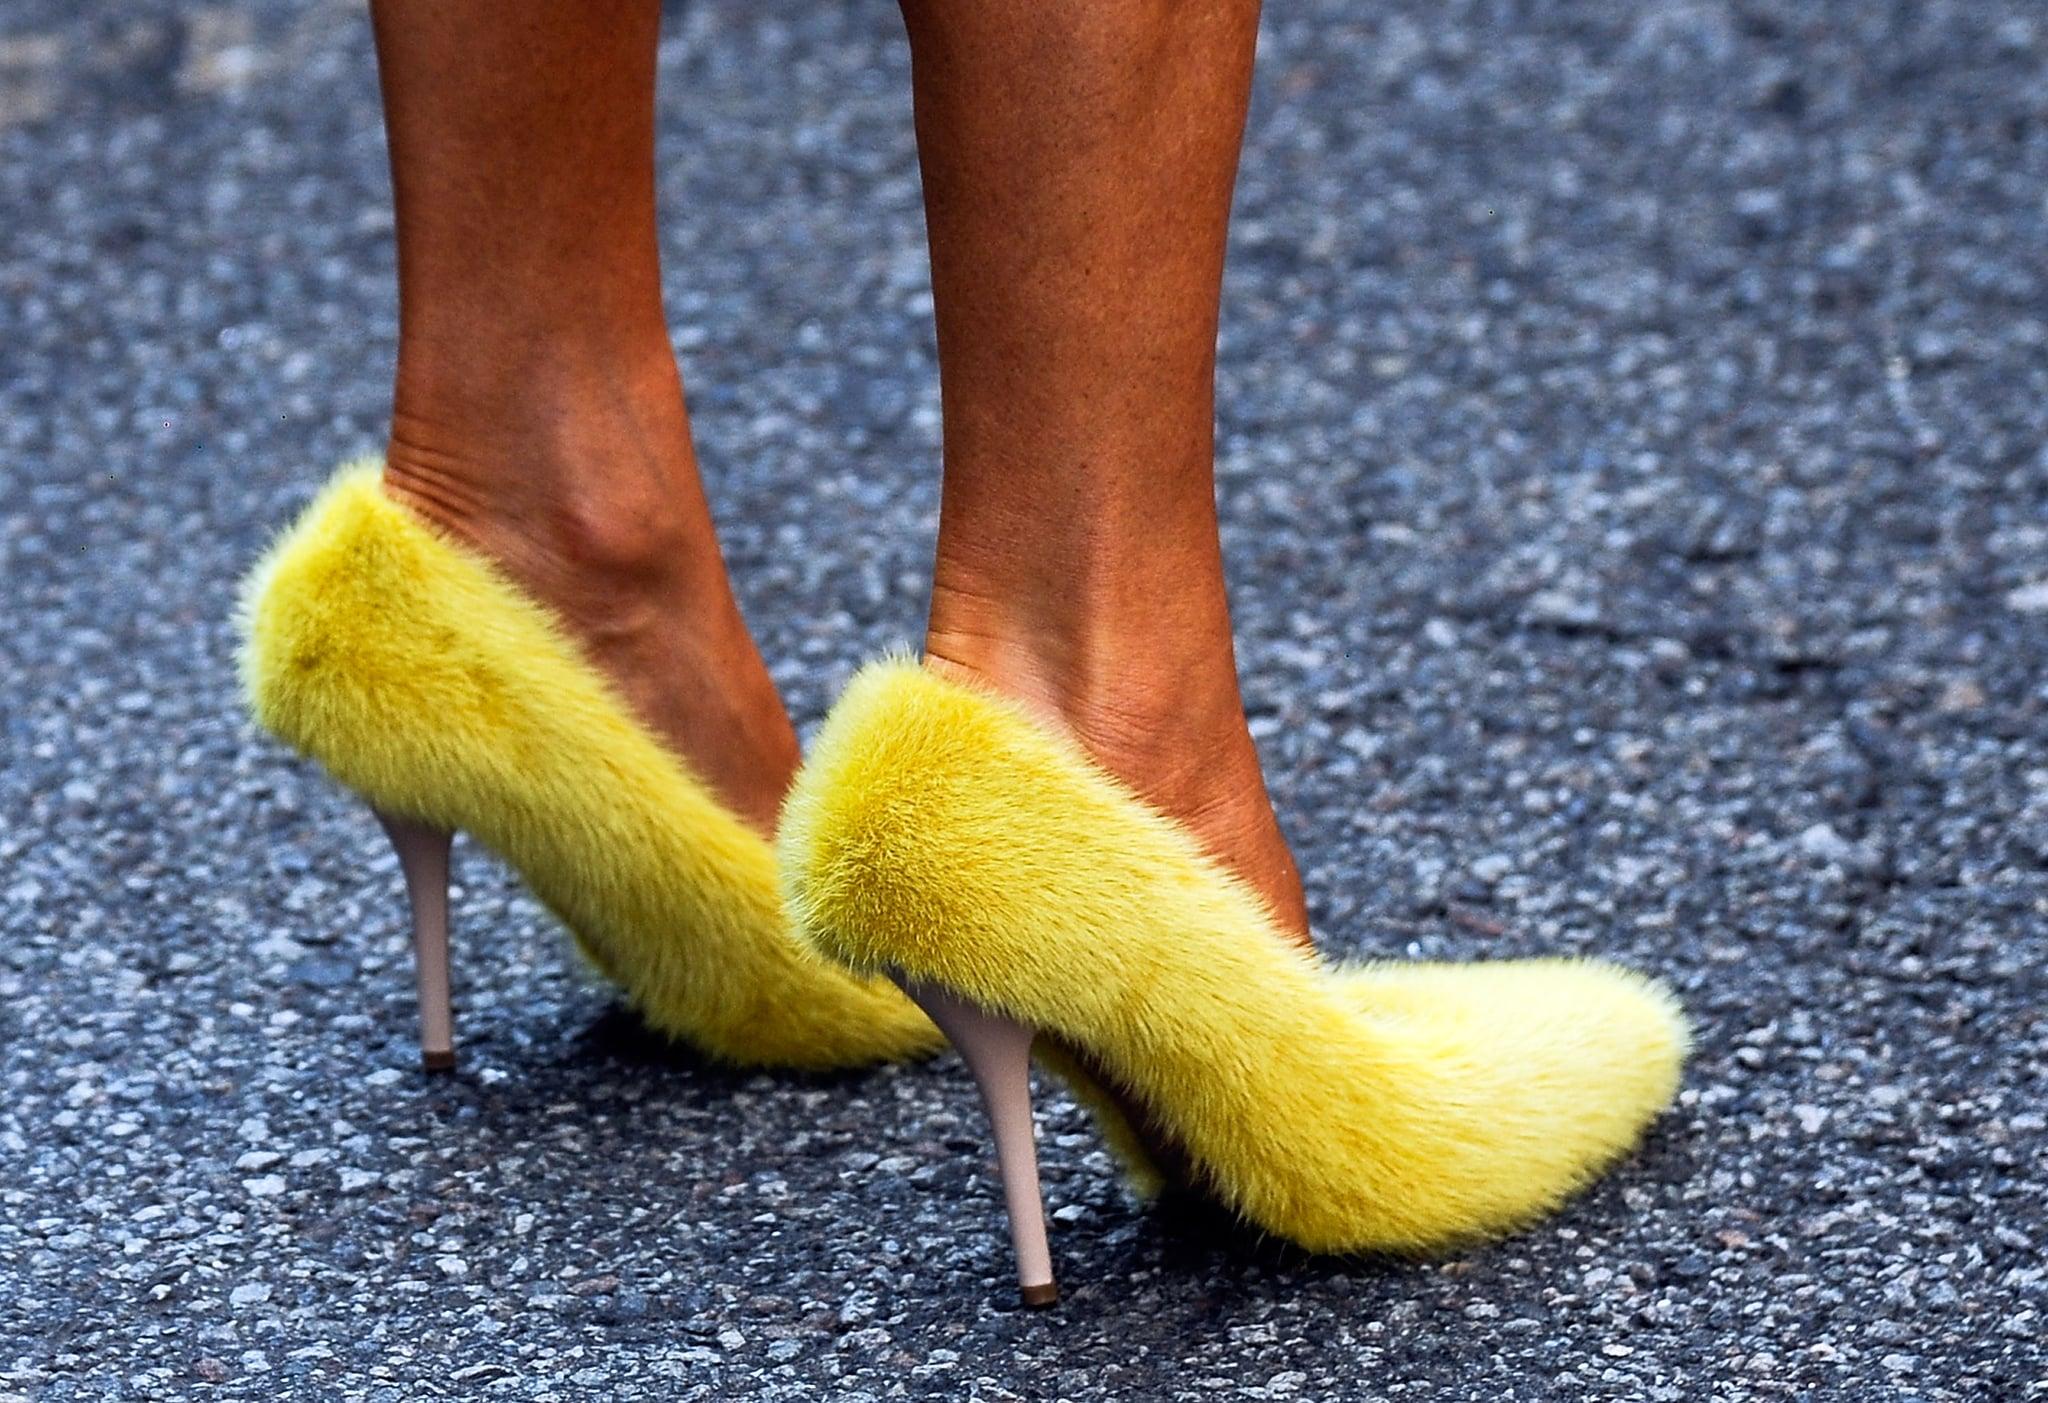 Big Bird? Nope, that's Anna Dello Russo in Celine's fuzzy yellow pumps.